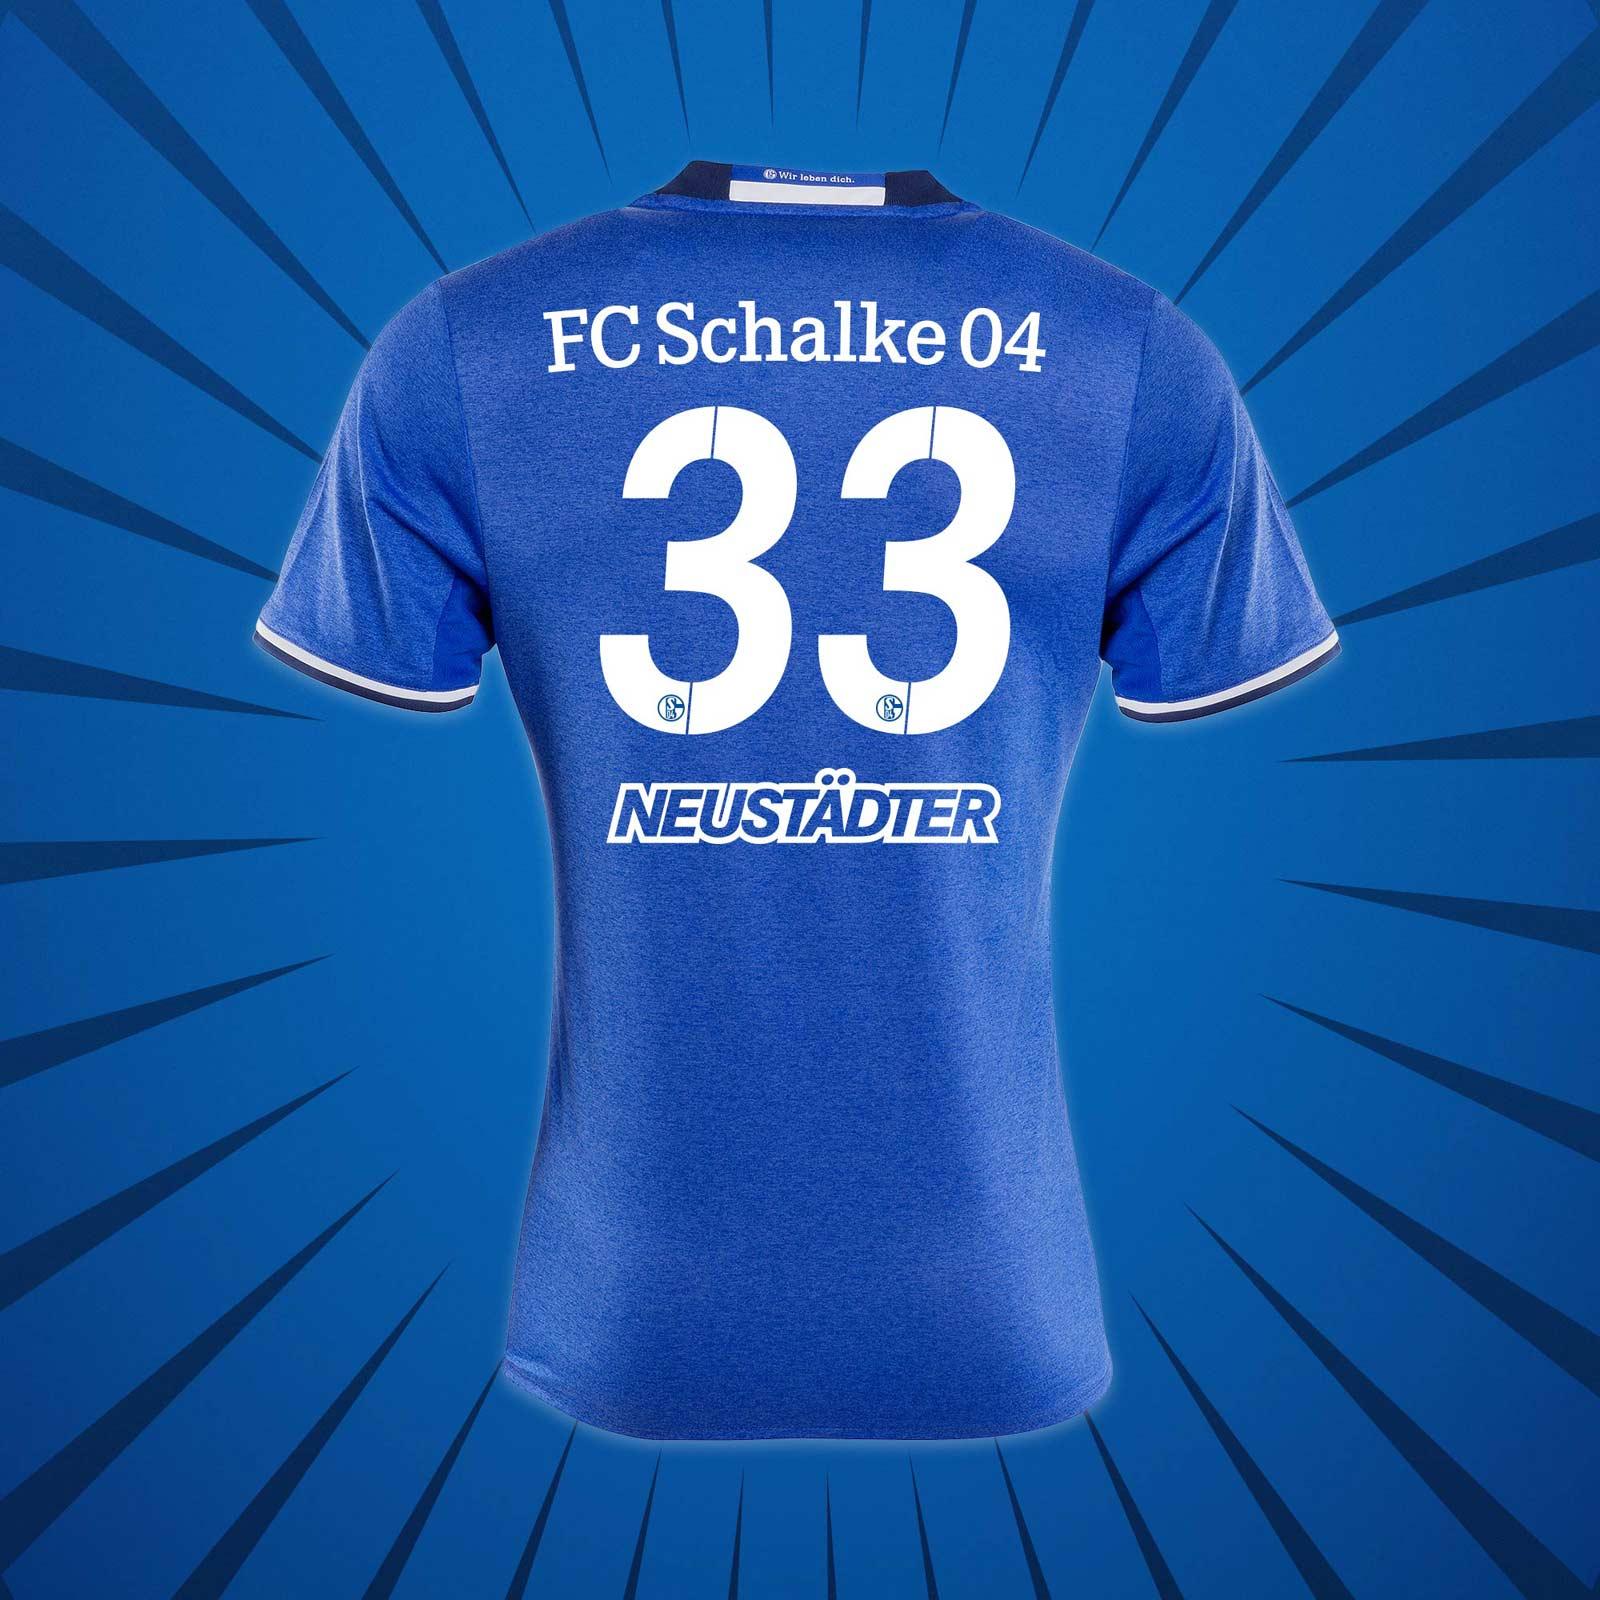 Flocage maillot domicile Schalke 2016-17 Adidas